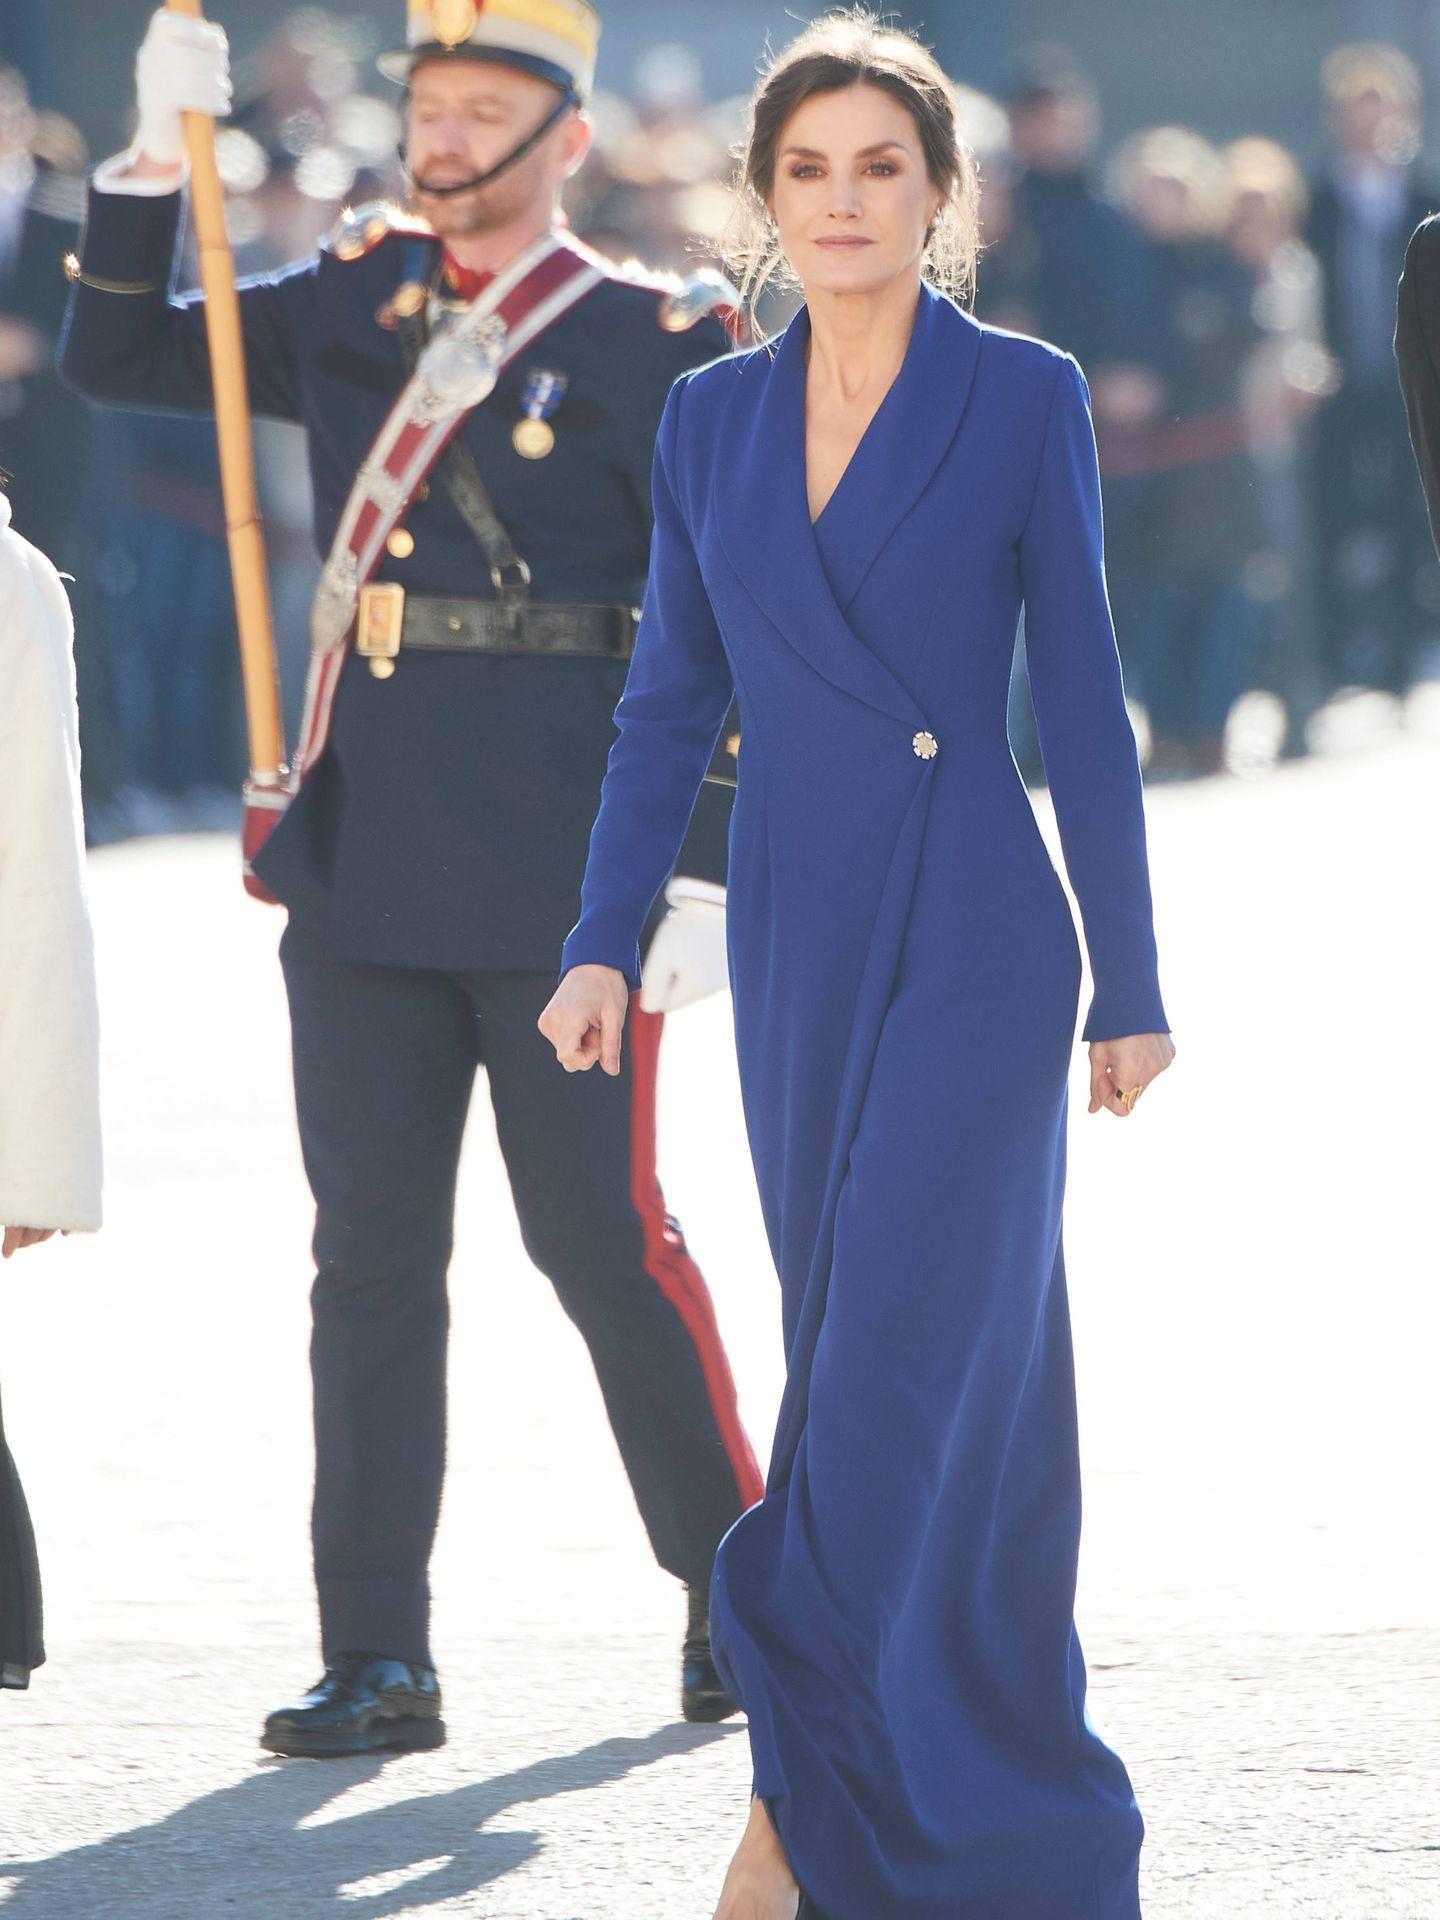 La reina Letizia, en la Pascua Militar, la última vez que lució un Felipe Varela. (Limited Pictures)